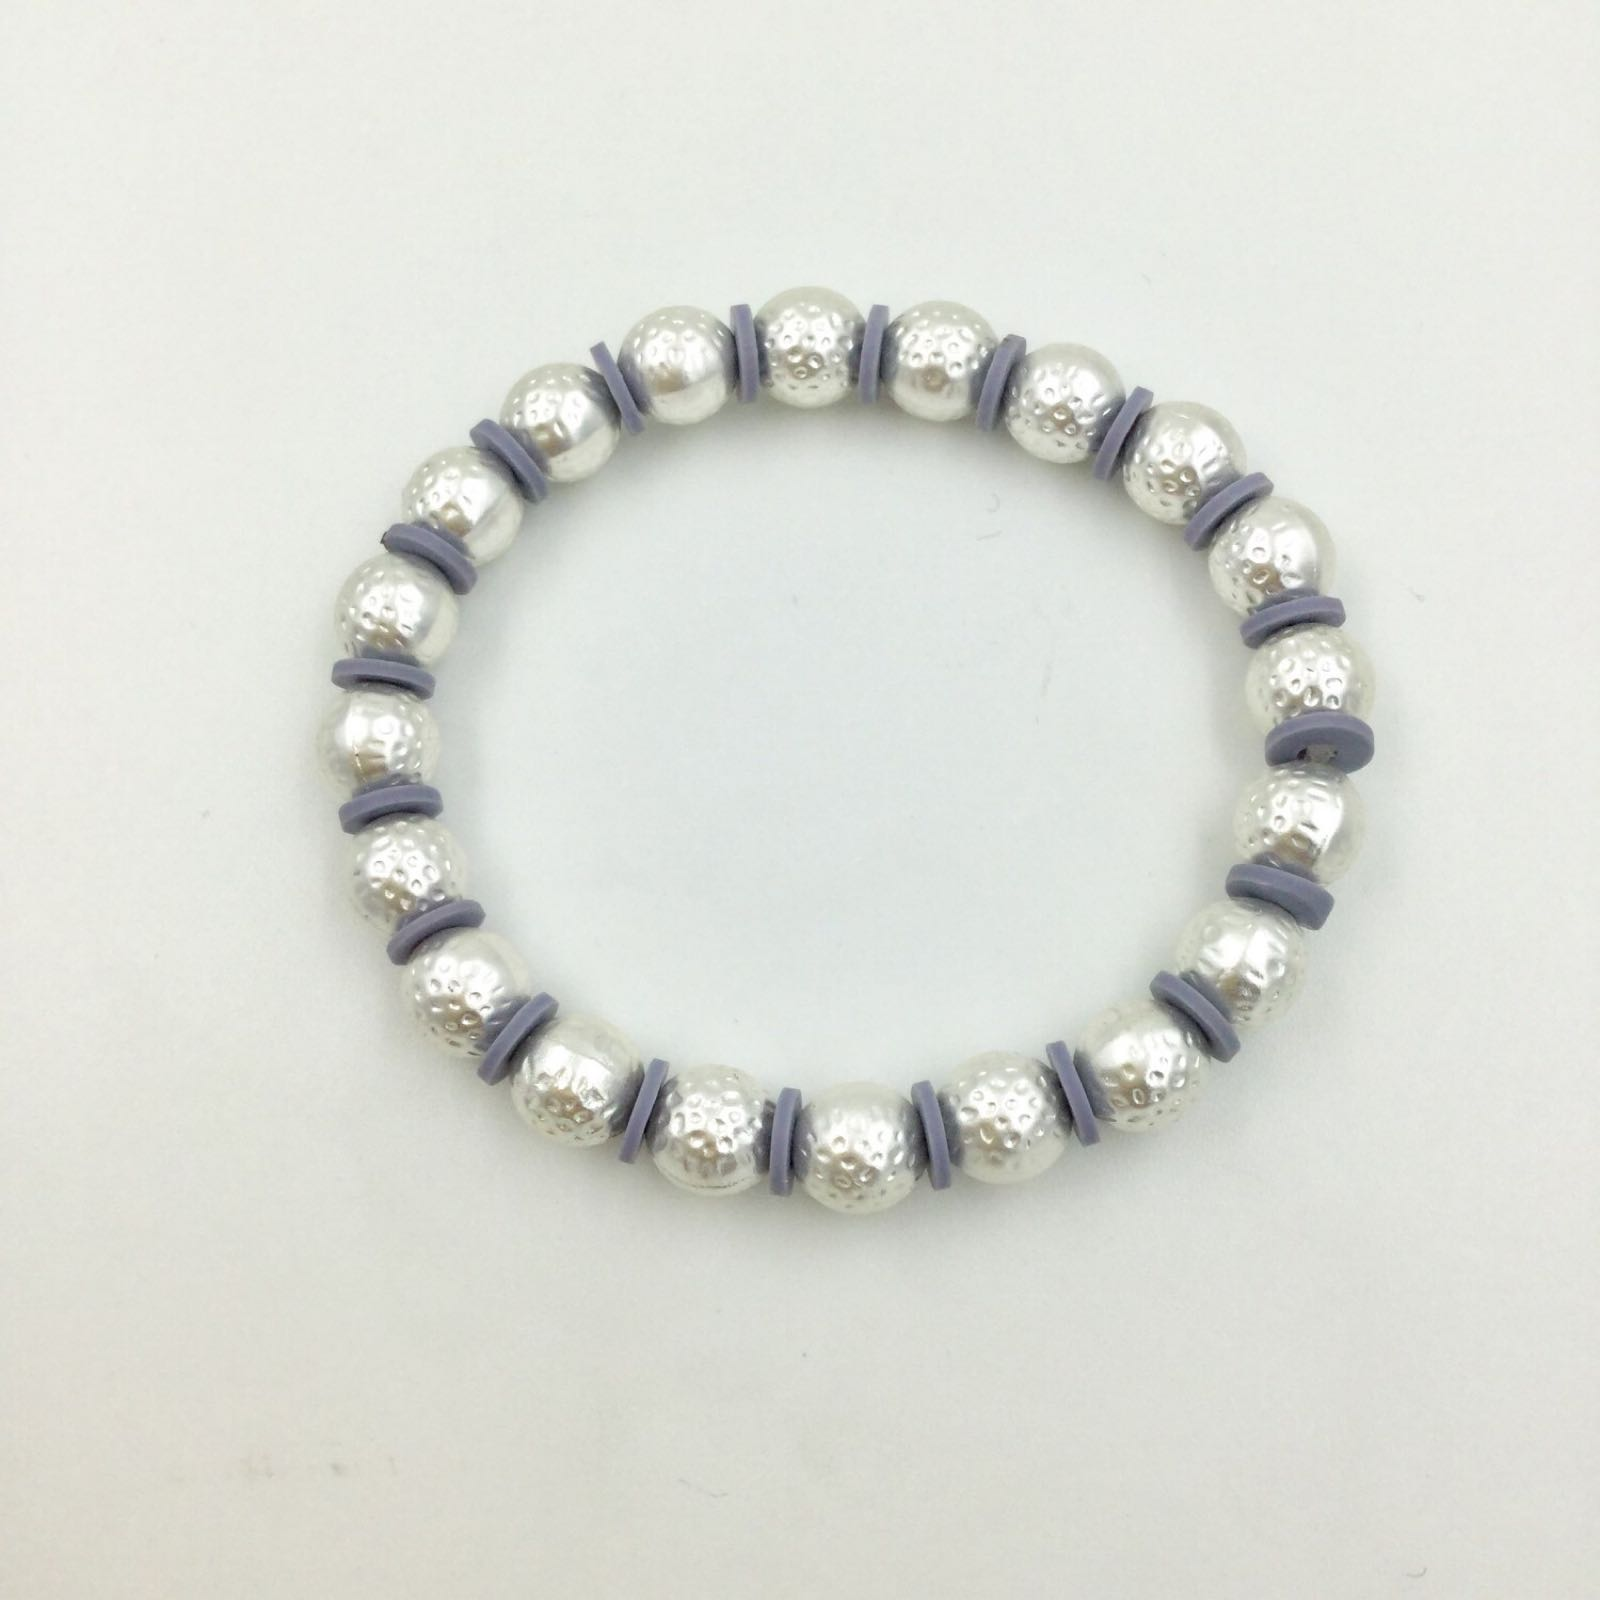 Elasticated Hammered Ball Bracelet - Silver